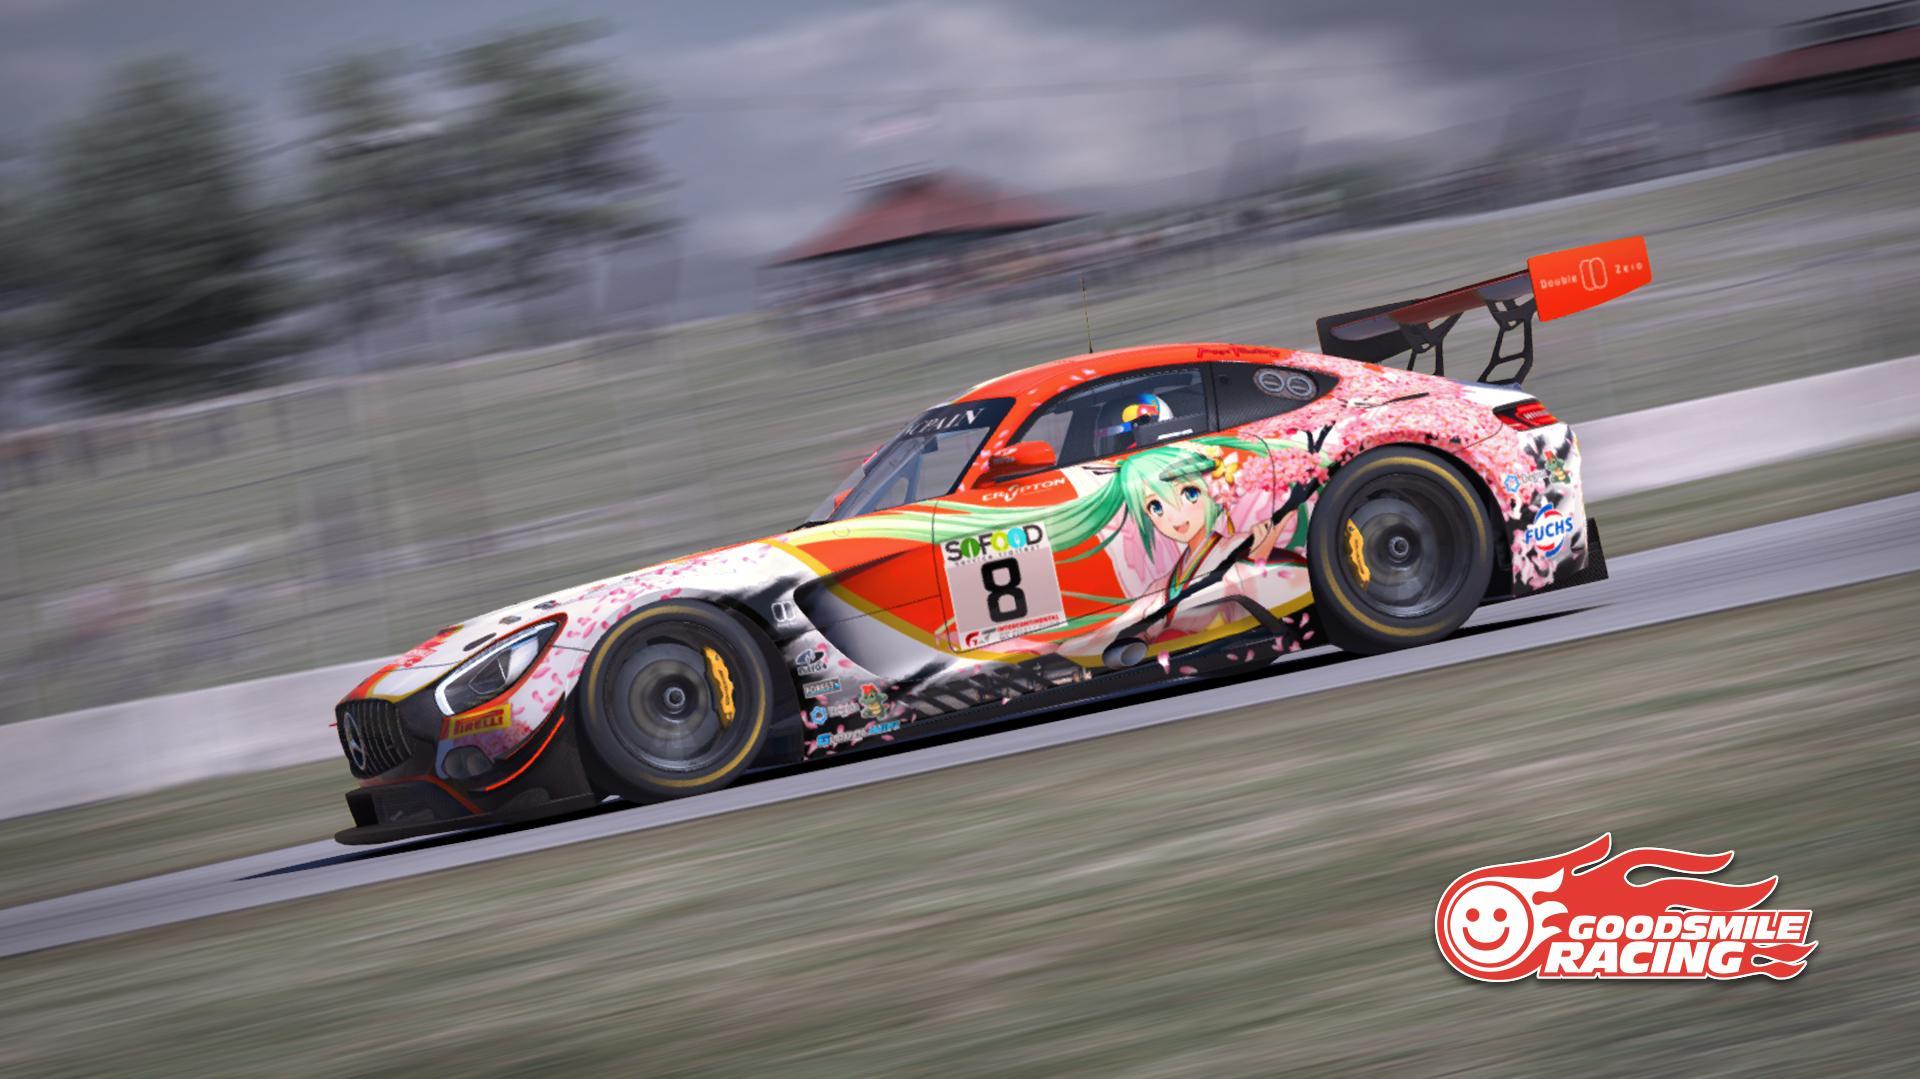 #00 GoodSmile Racing & Team Ukyo Mercedes AMG GT3 (2017 ...